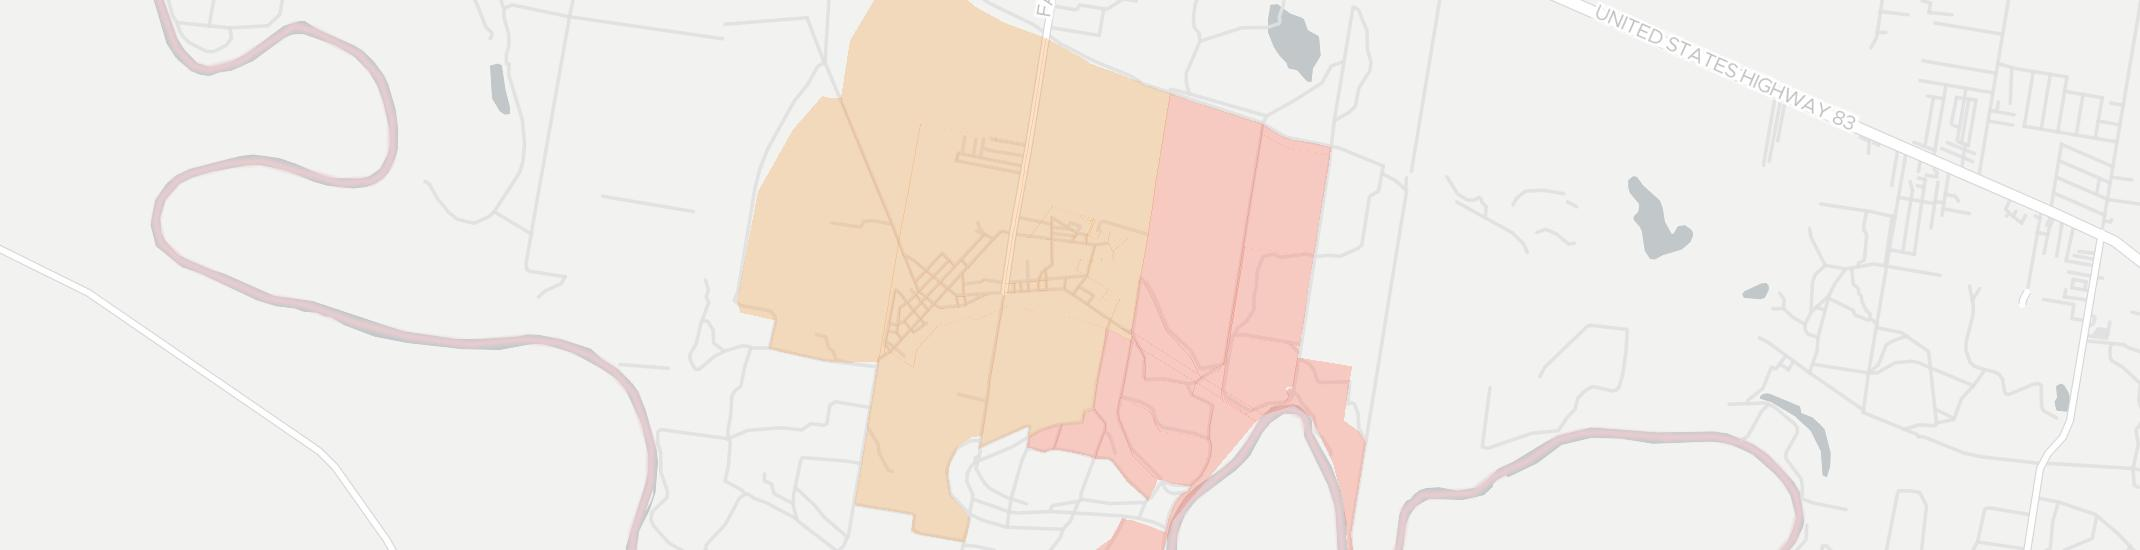 La Grulla Internet Competition Map. Click for interactive map.